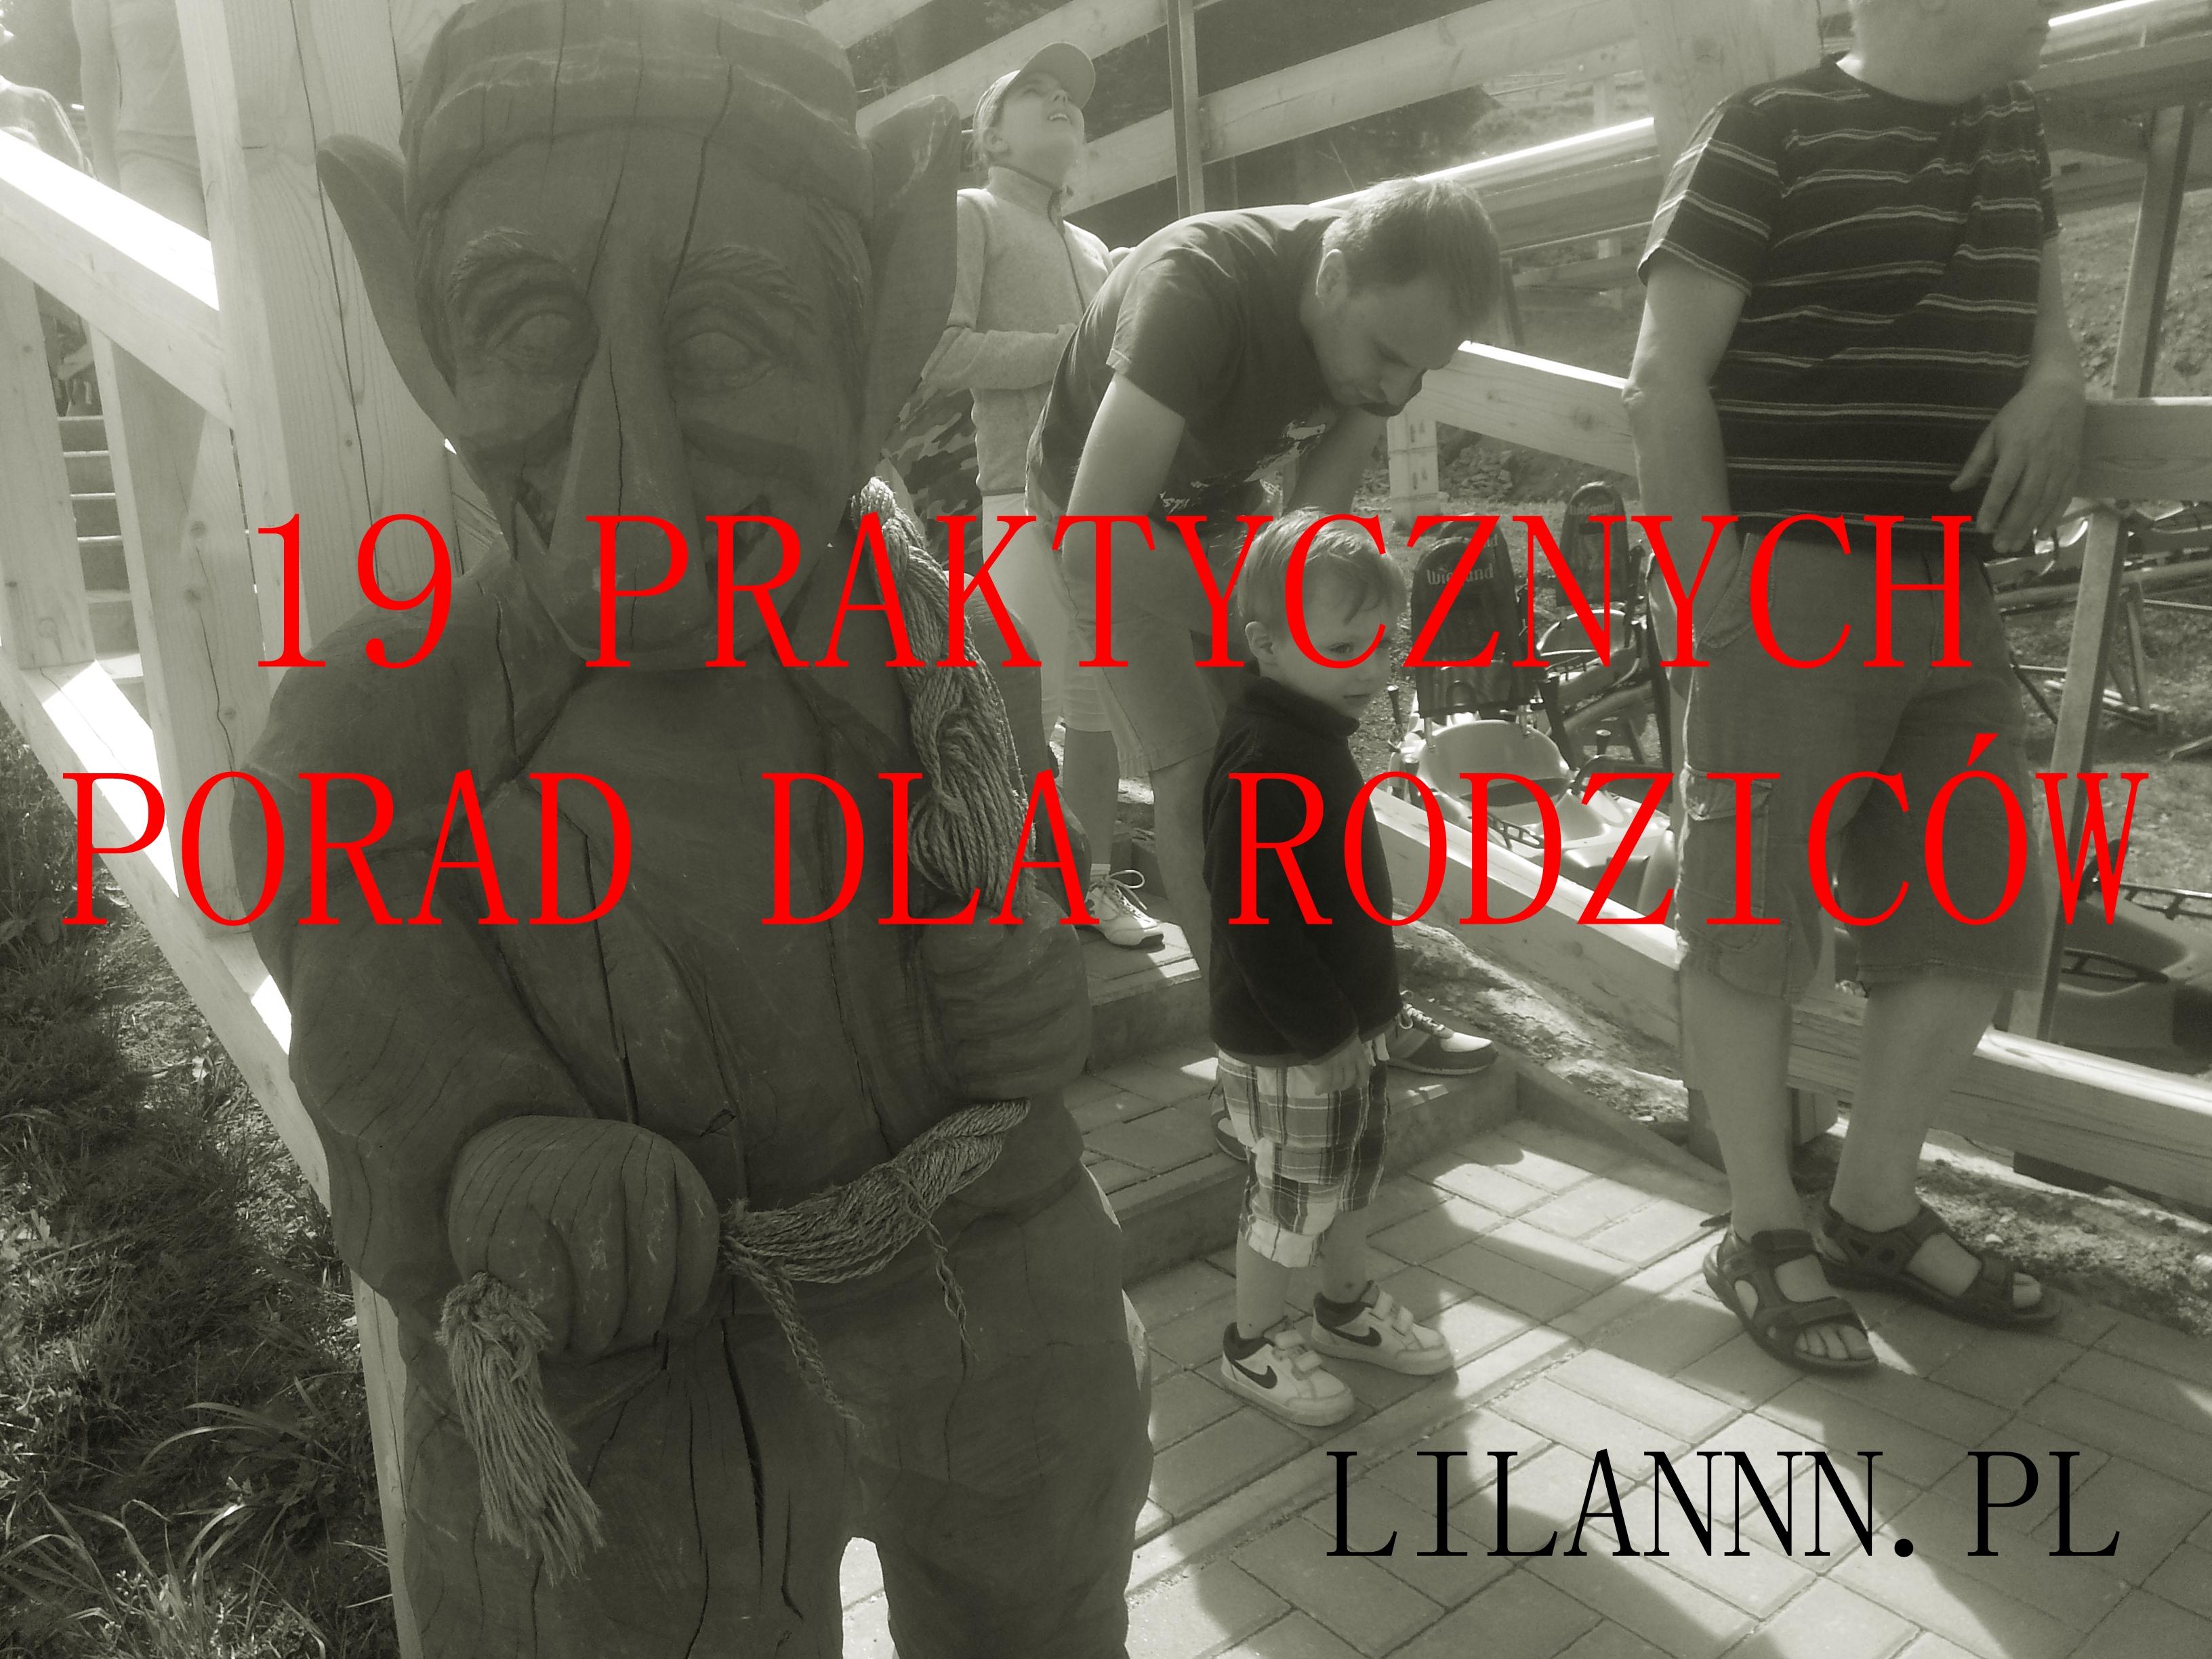 lilannn_pl